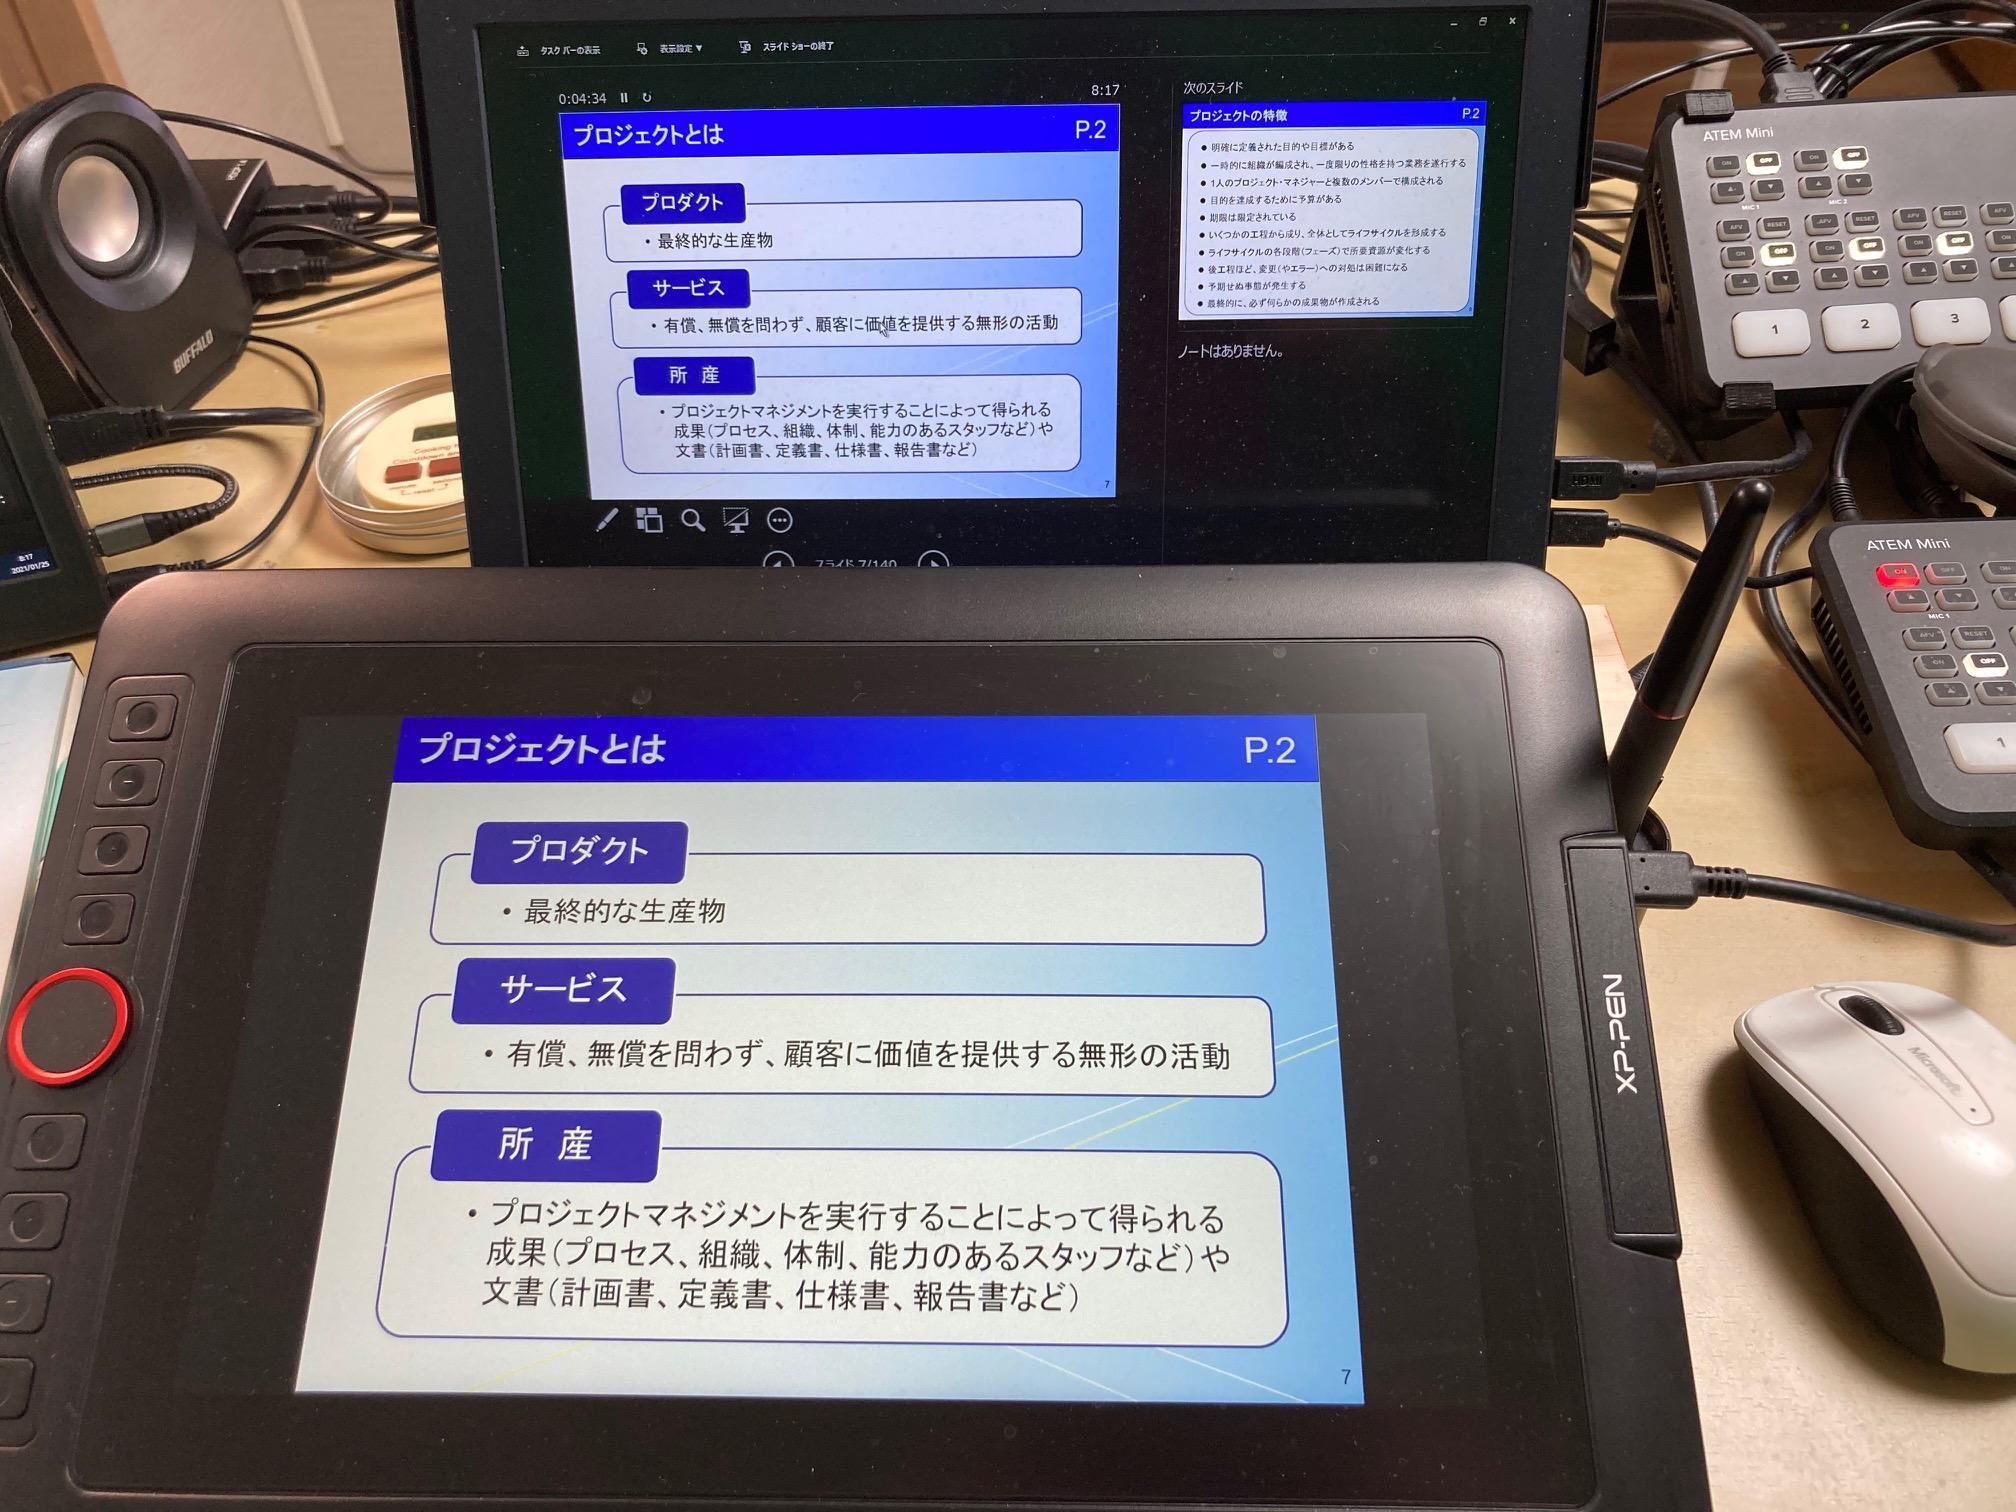 https://blogs.itmedia.co.jp/tani/82098a65b67d2c03359d18cb1152e35aa57c50b2.jpg